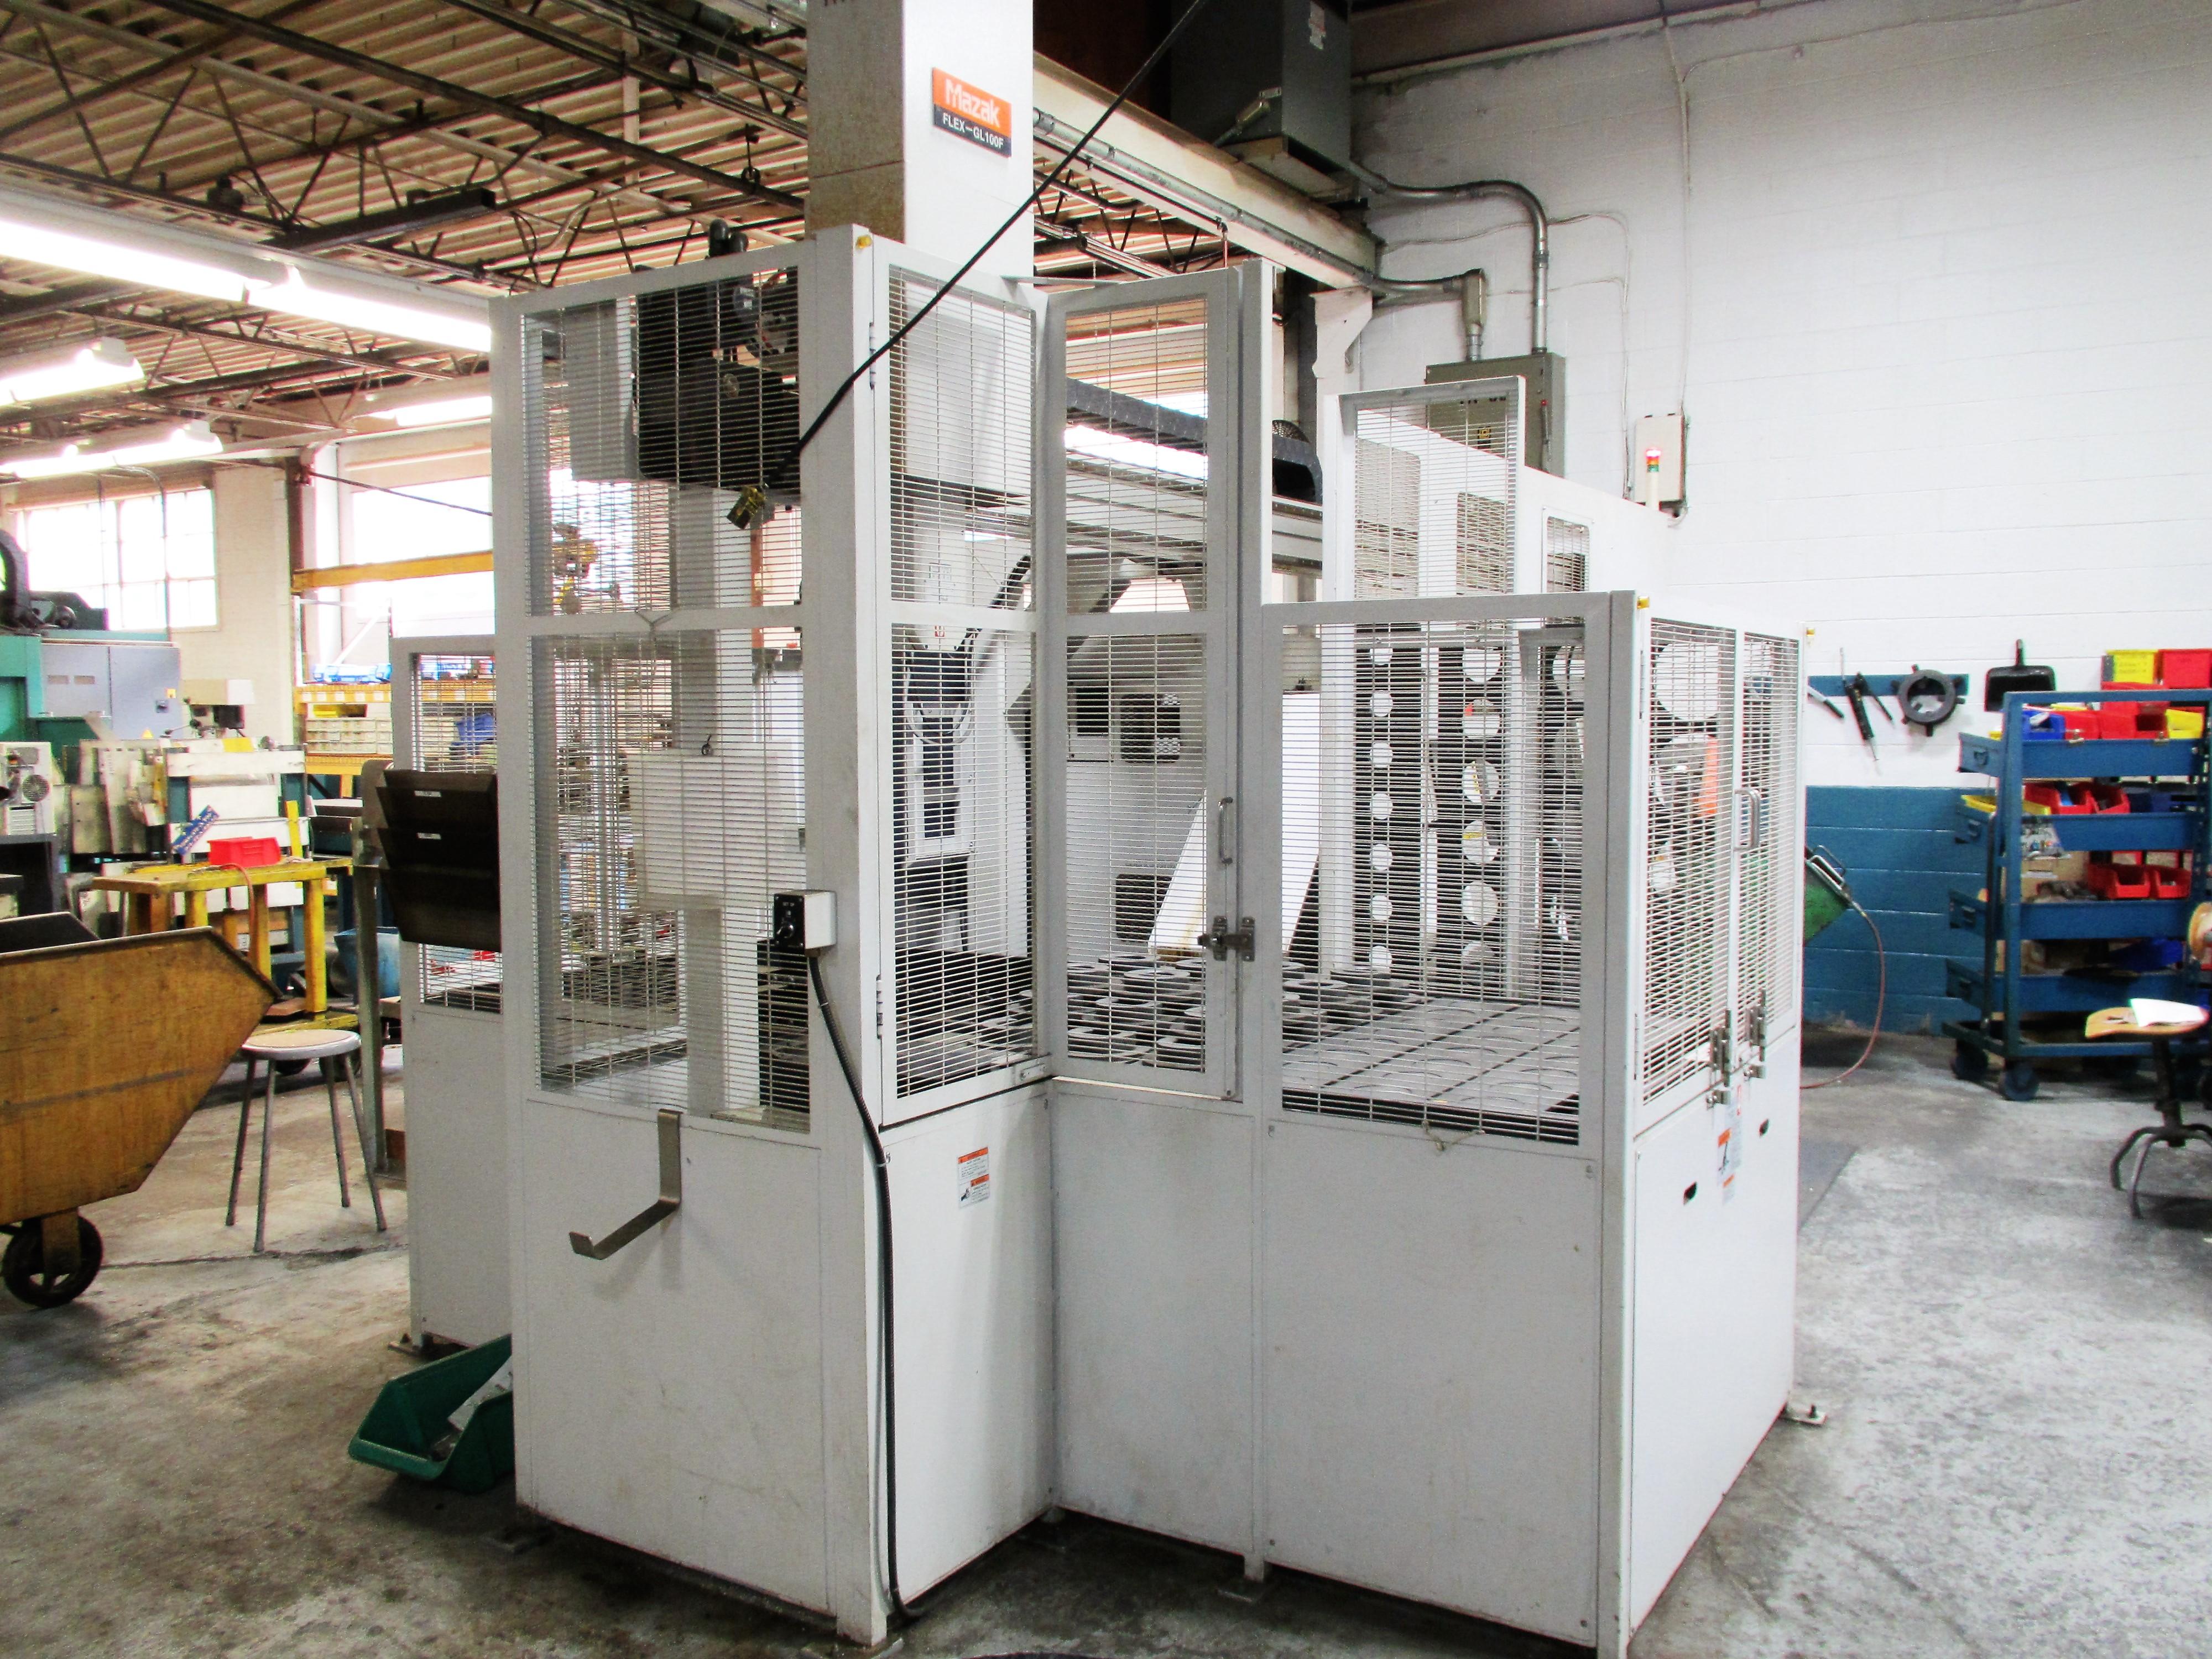 MAZAK QUICK TURN NEXUS 250-II MSY CNC TURNING CENTER - Image 13 of 16